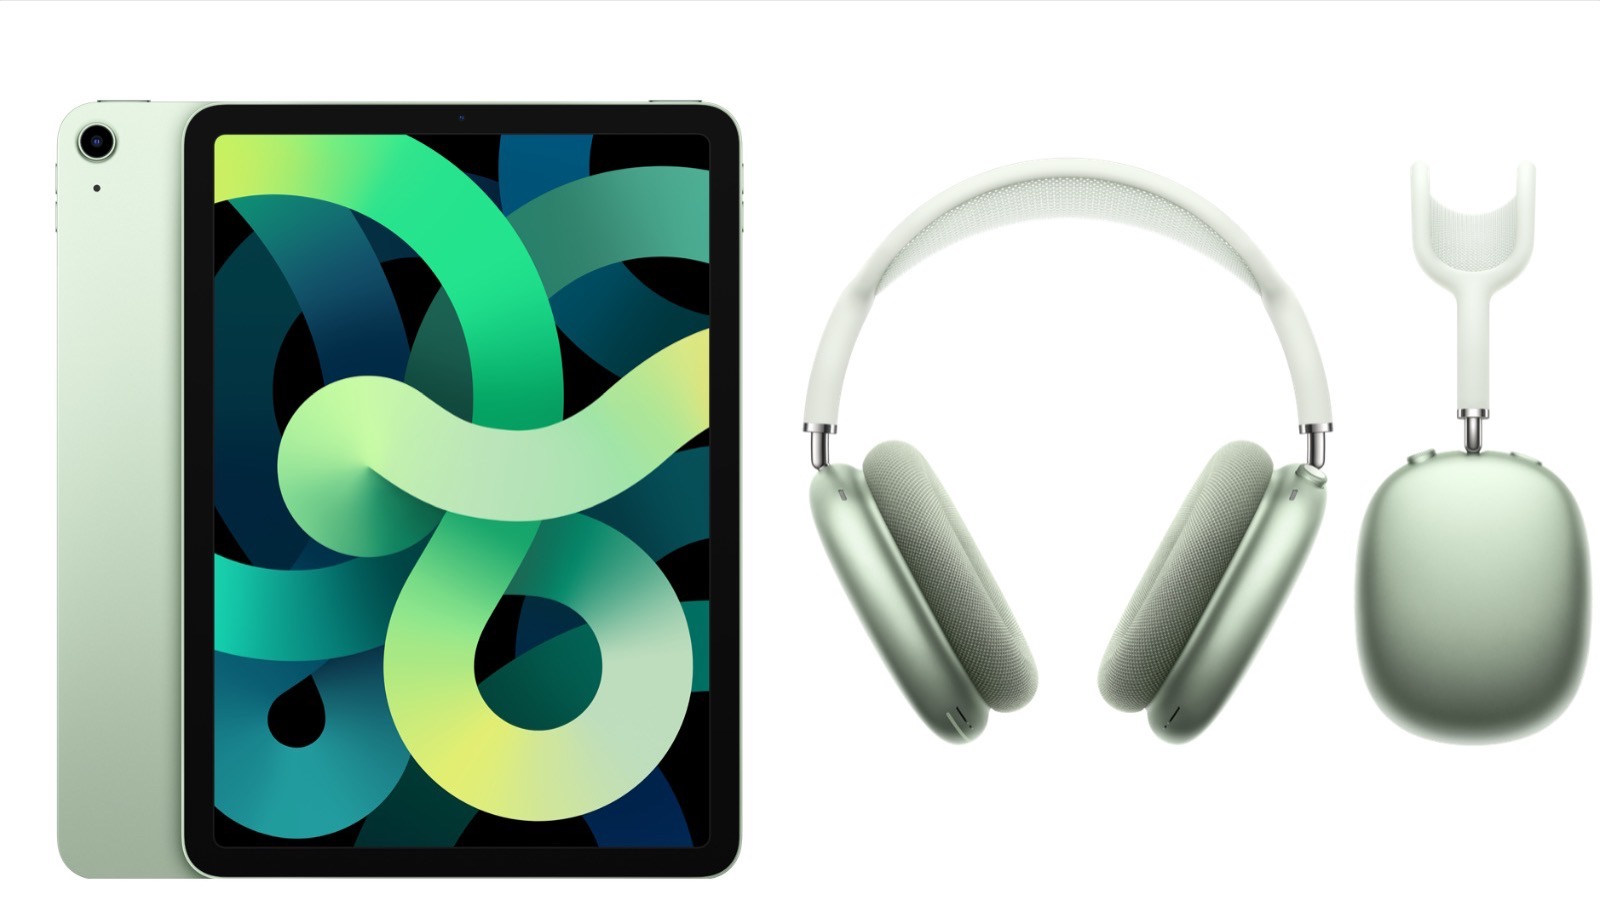 AirPodsMax and iPadAir Green colors